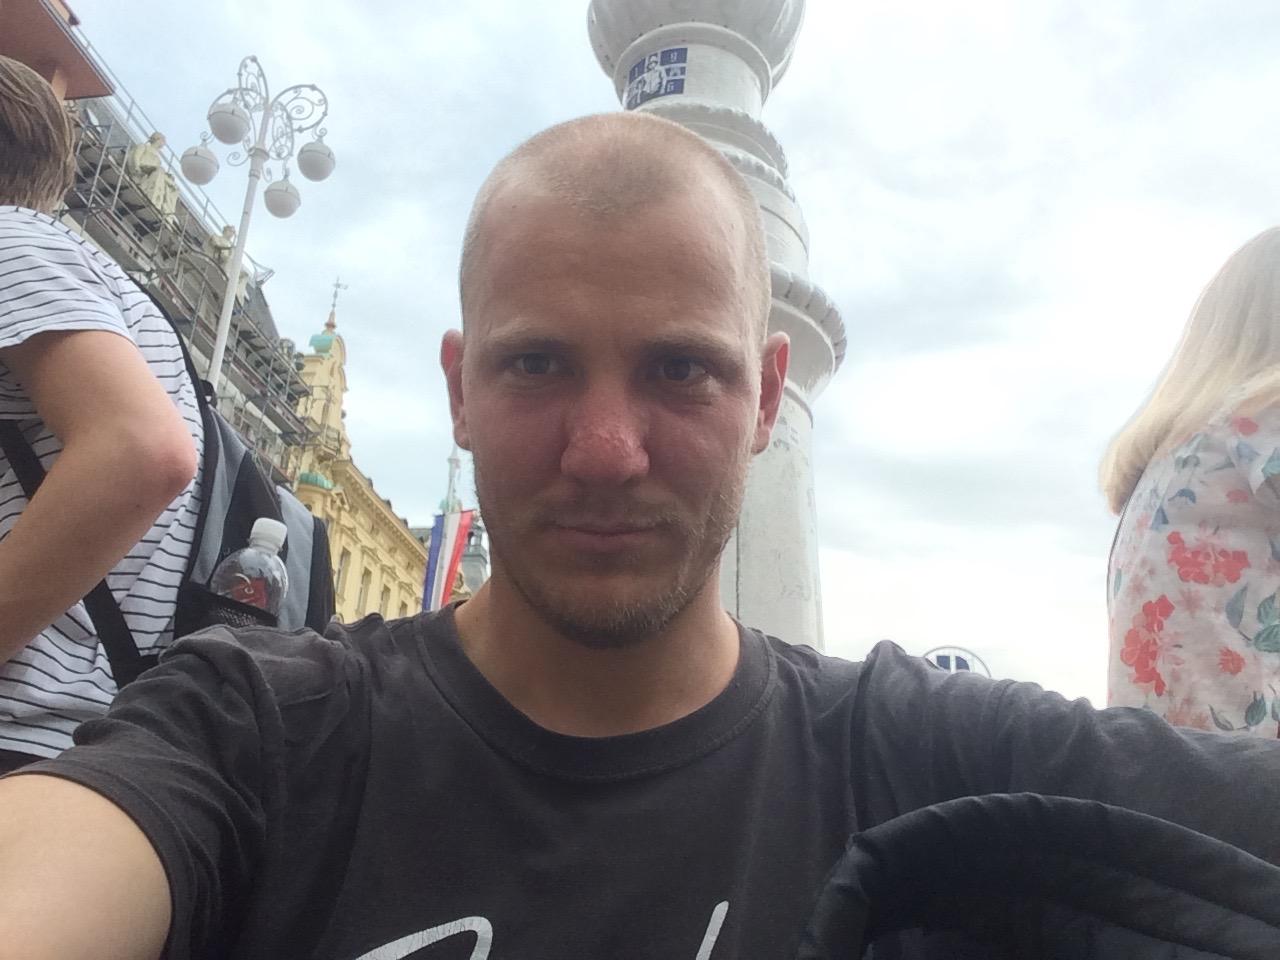 Ban Jelačić Square in Zagreb w/ new haircut.